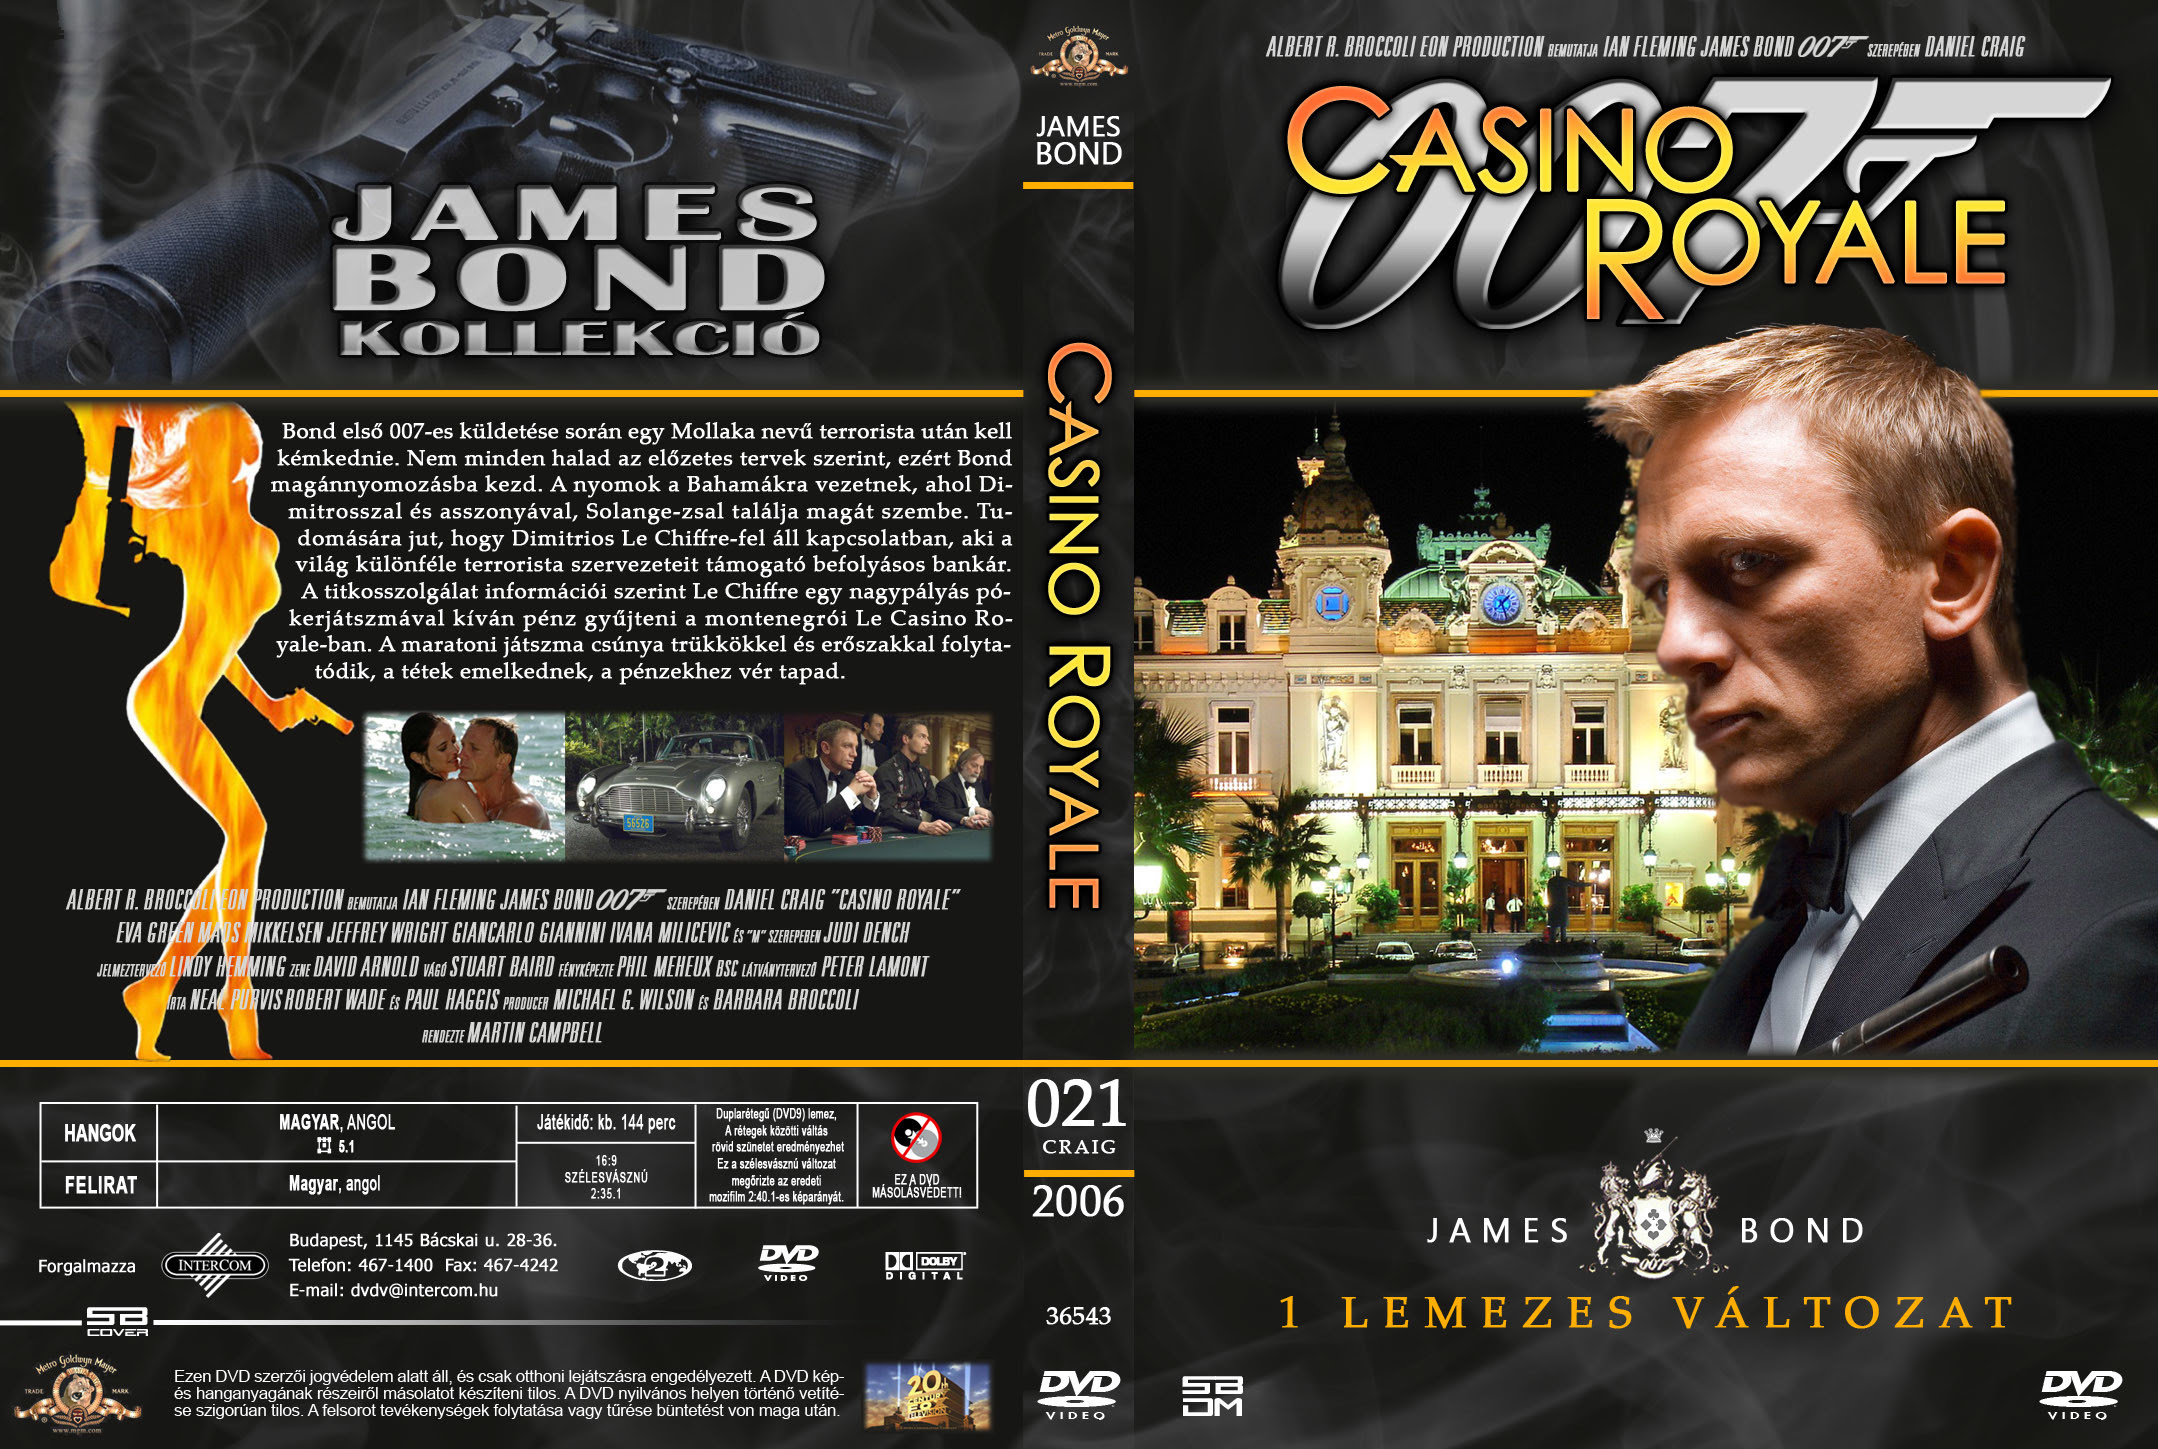 Casino royale watch online free movie